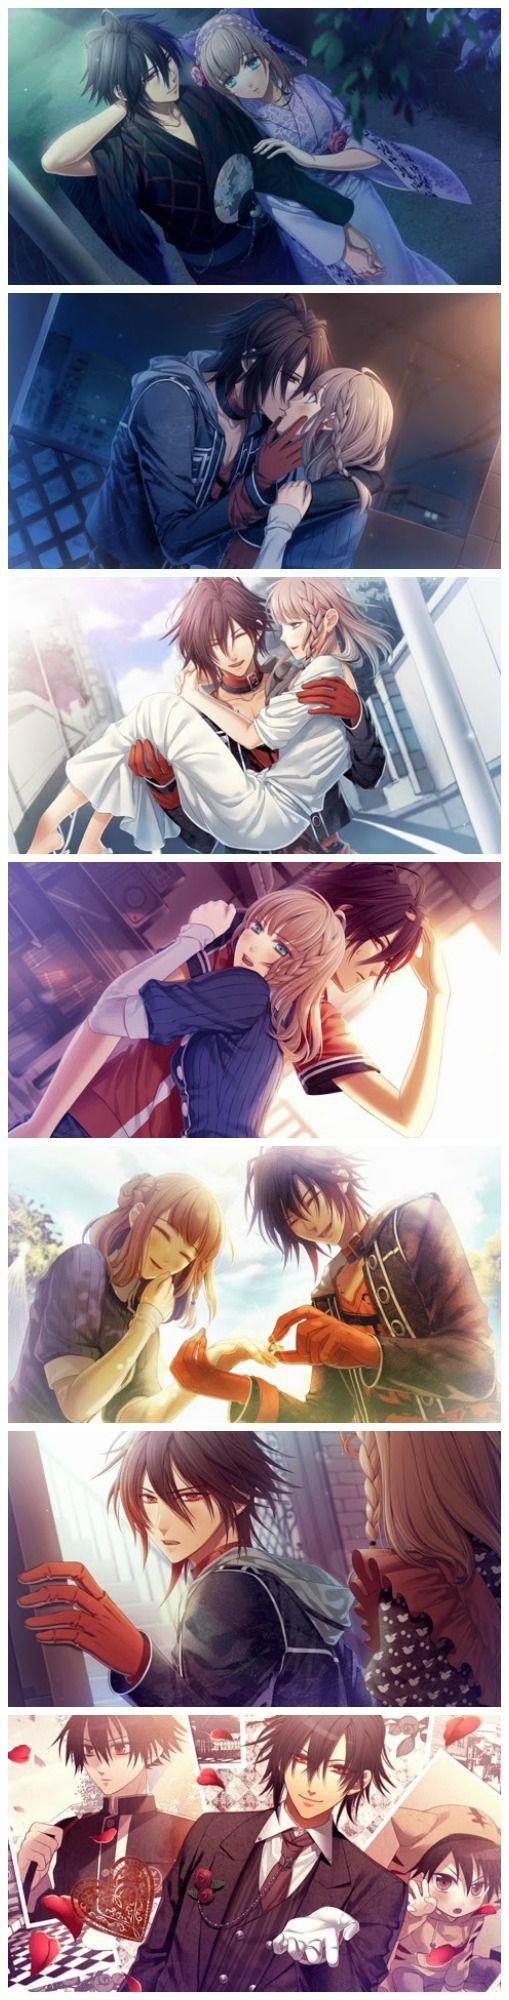 Heroine And Shin The Photos Are Out Of Order But Anyway Amnesia ShinAmnesia AnimeAmnesia